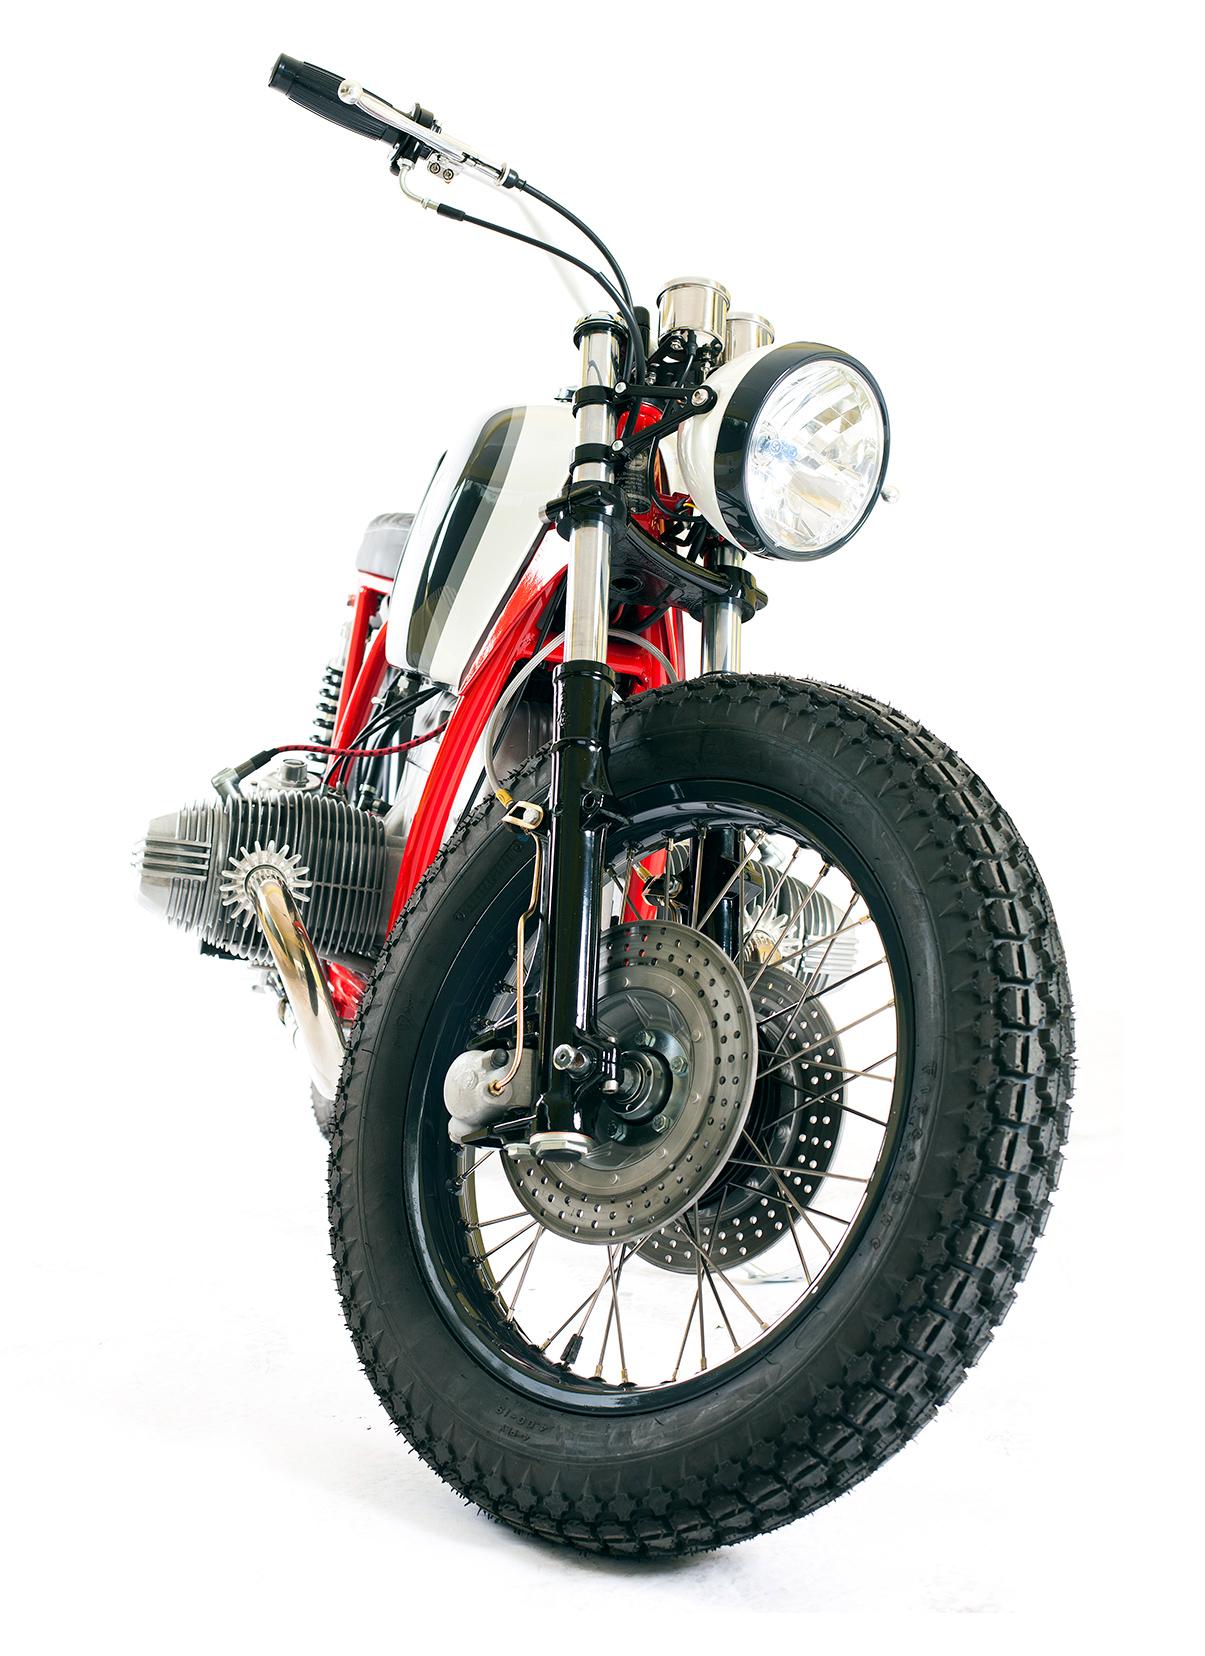 maria_motorcycles_bmw_r75_6_panzer_3575